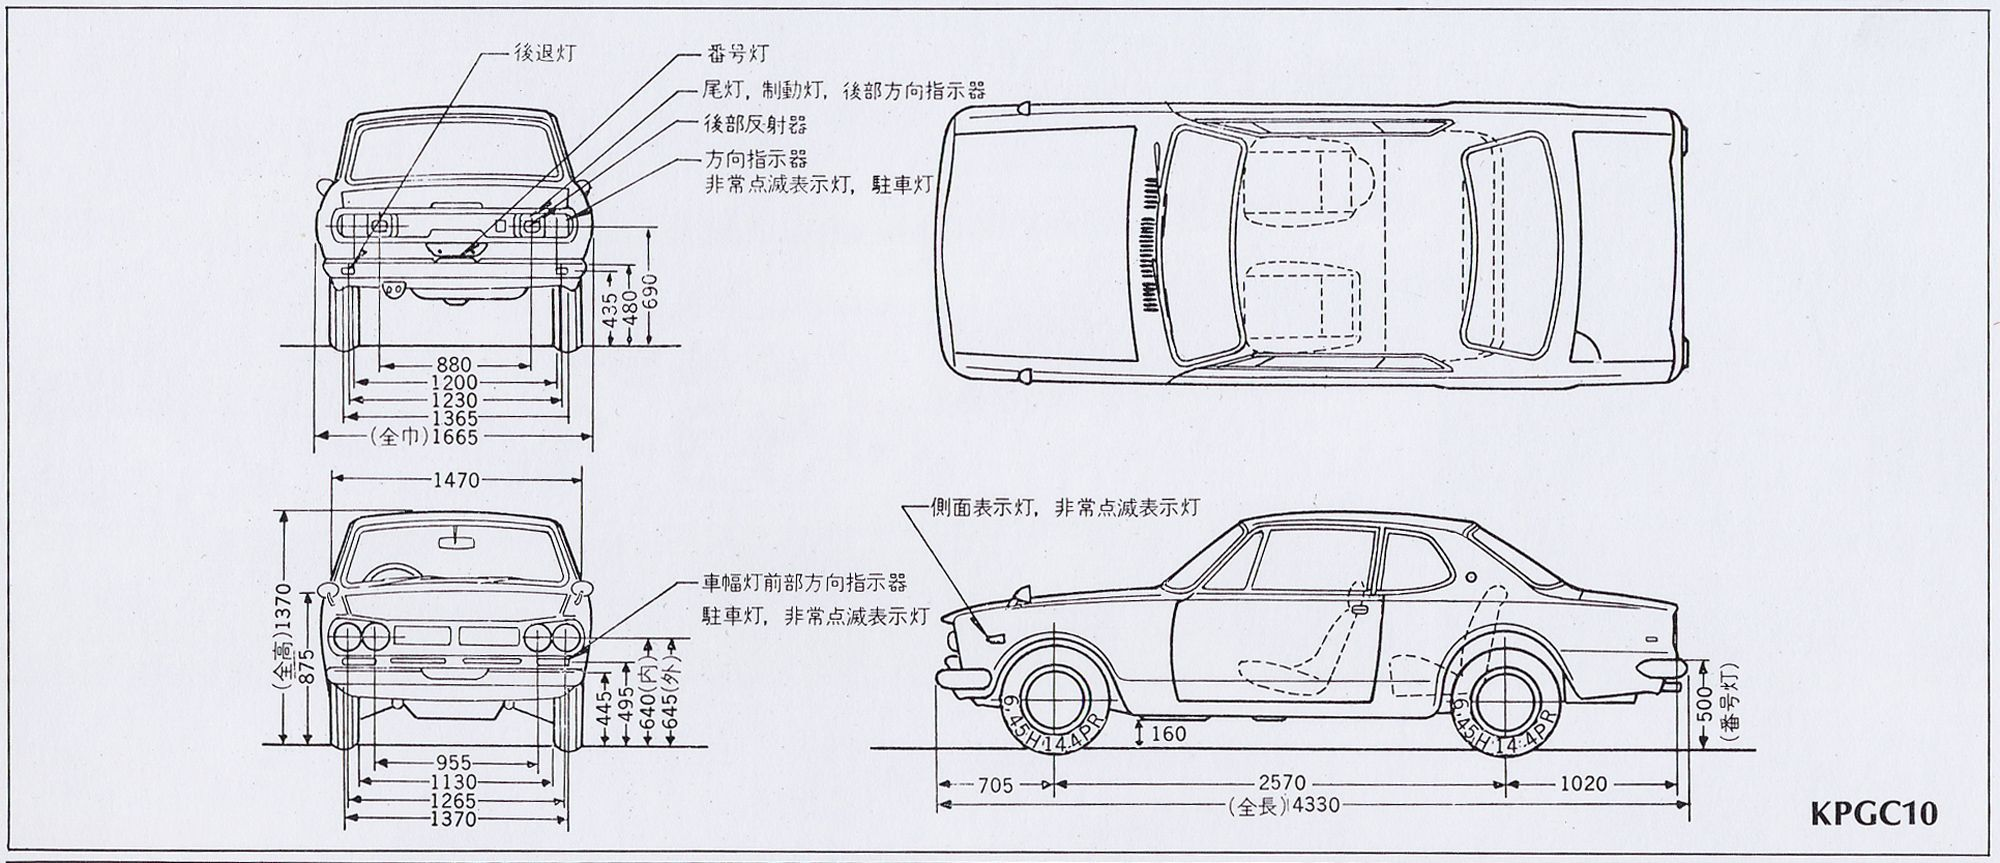 small resolution of dimension kpgc hakosuka nissan skyline 2000 skyline gtr jdm cars automobile